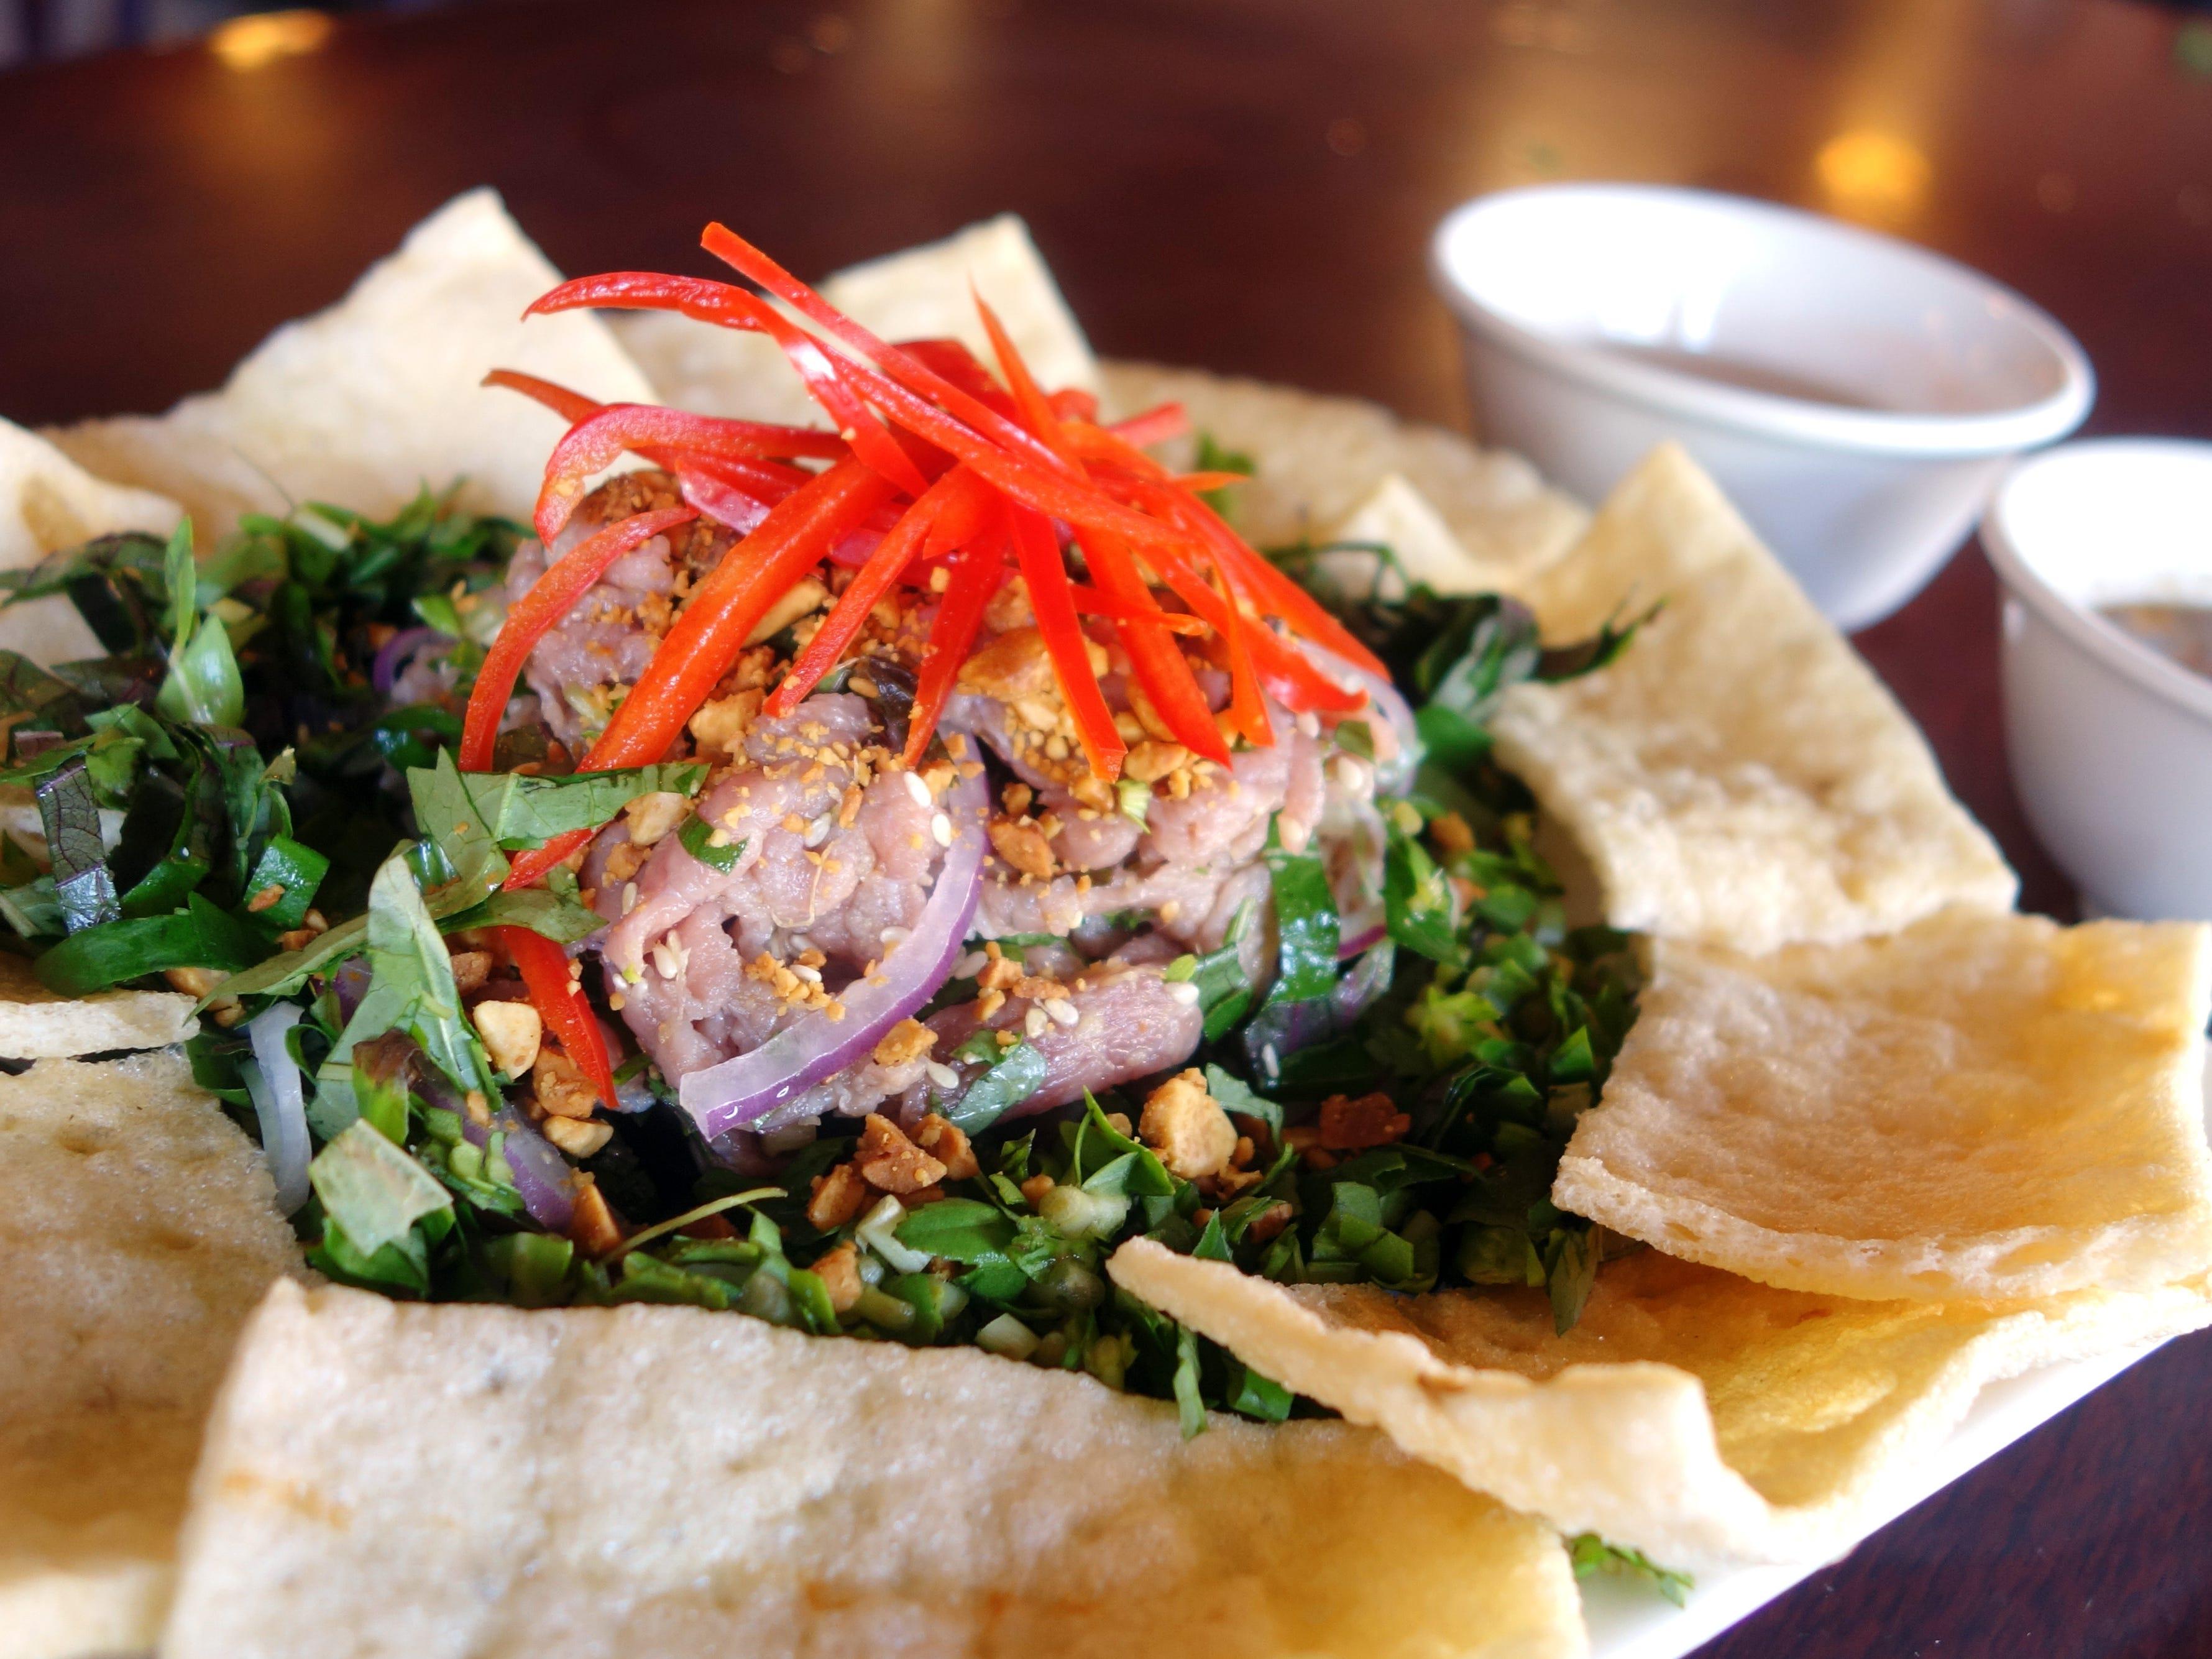 Bo tai chanh (rare beef salad) at Pho Avina in Glendale, AZ.